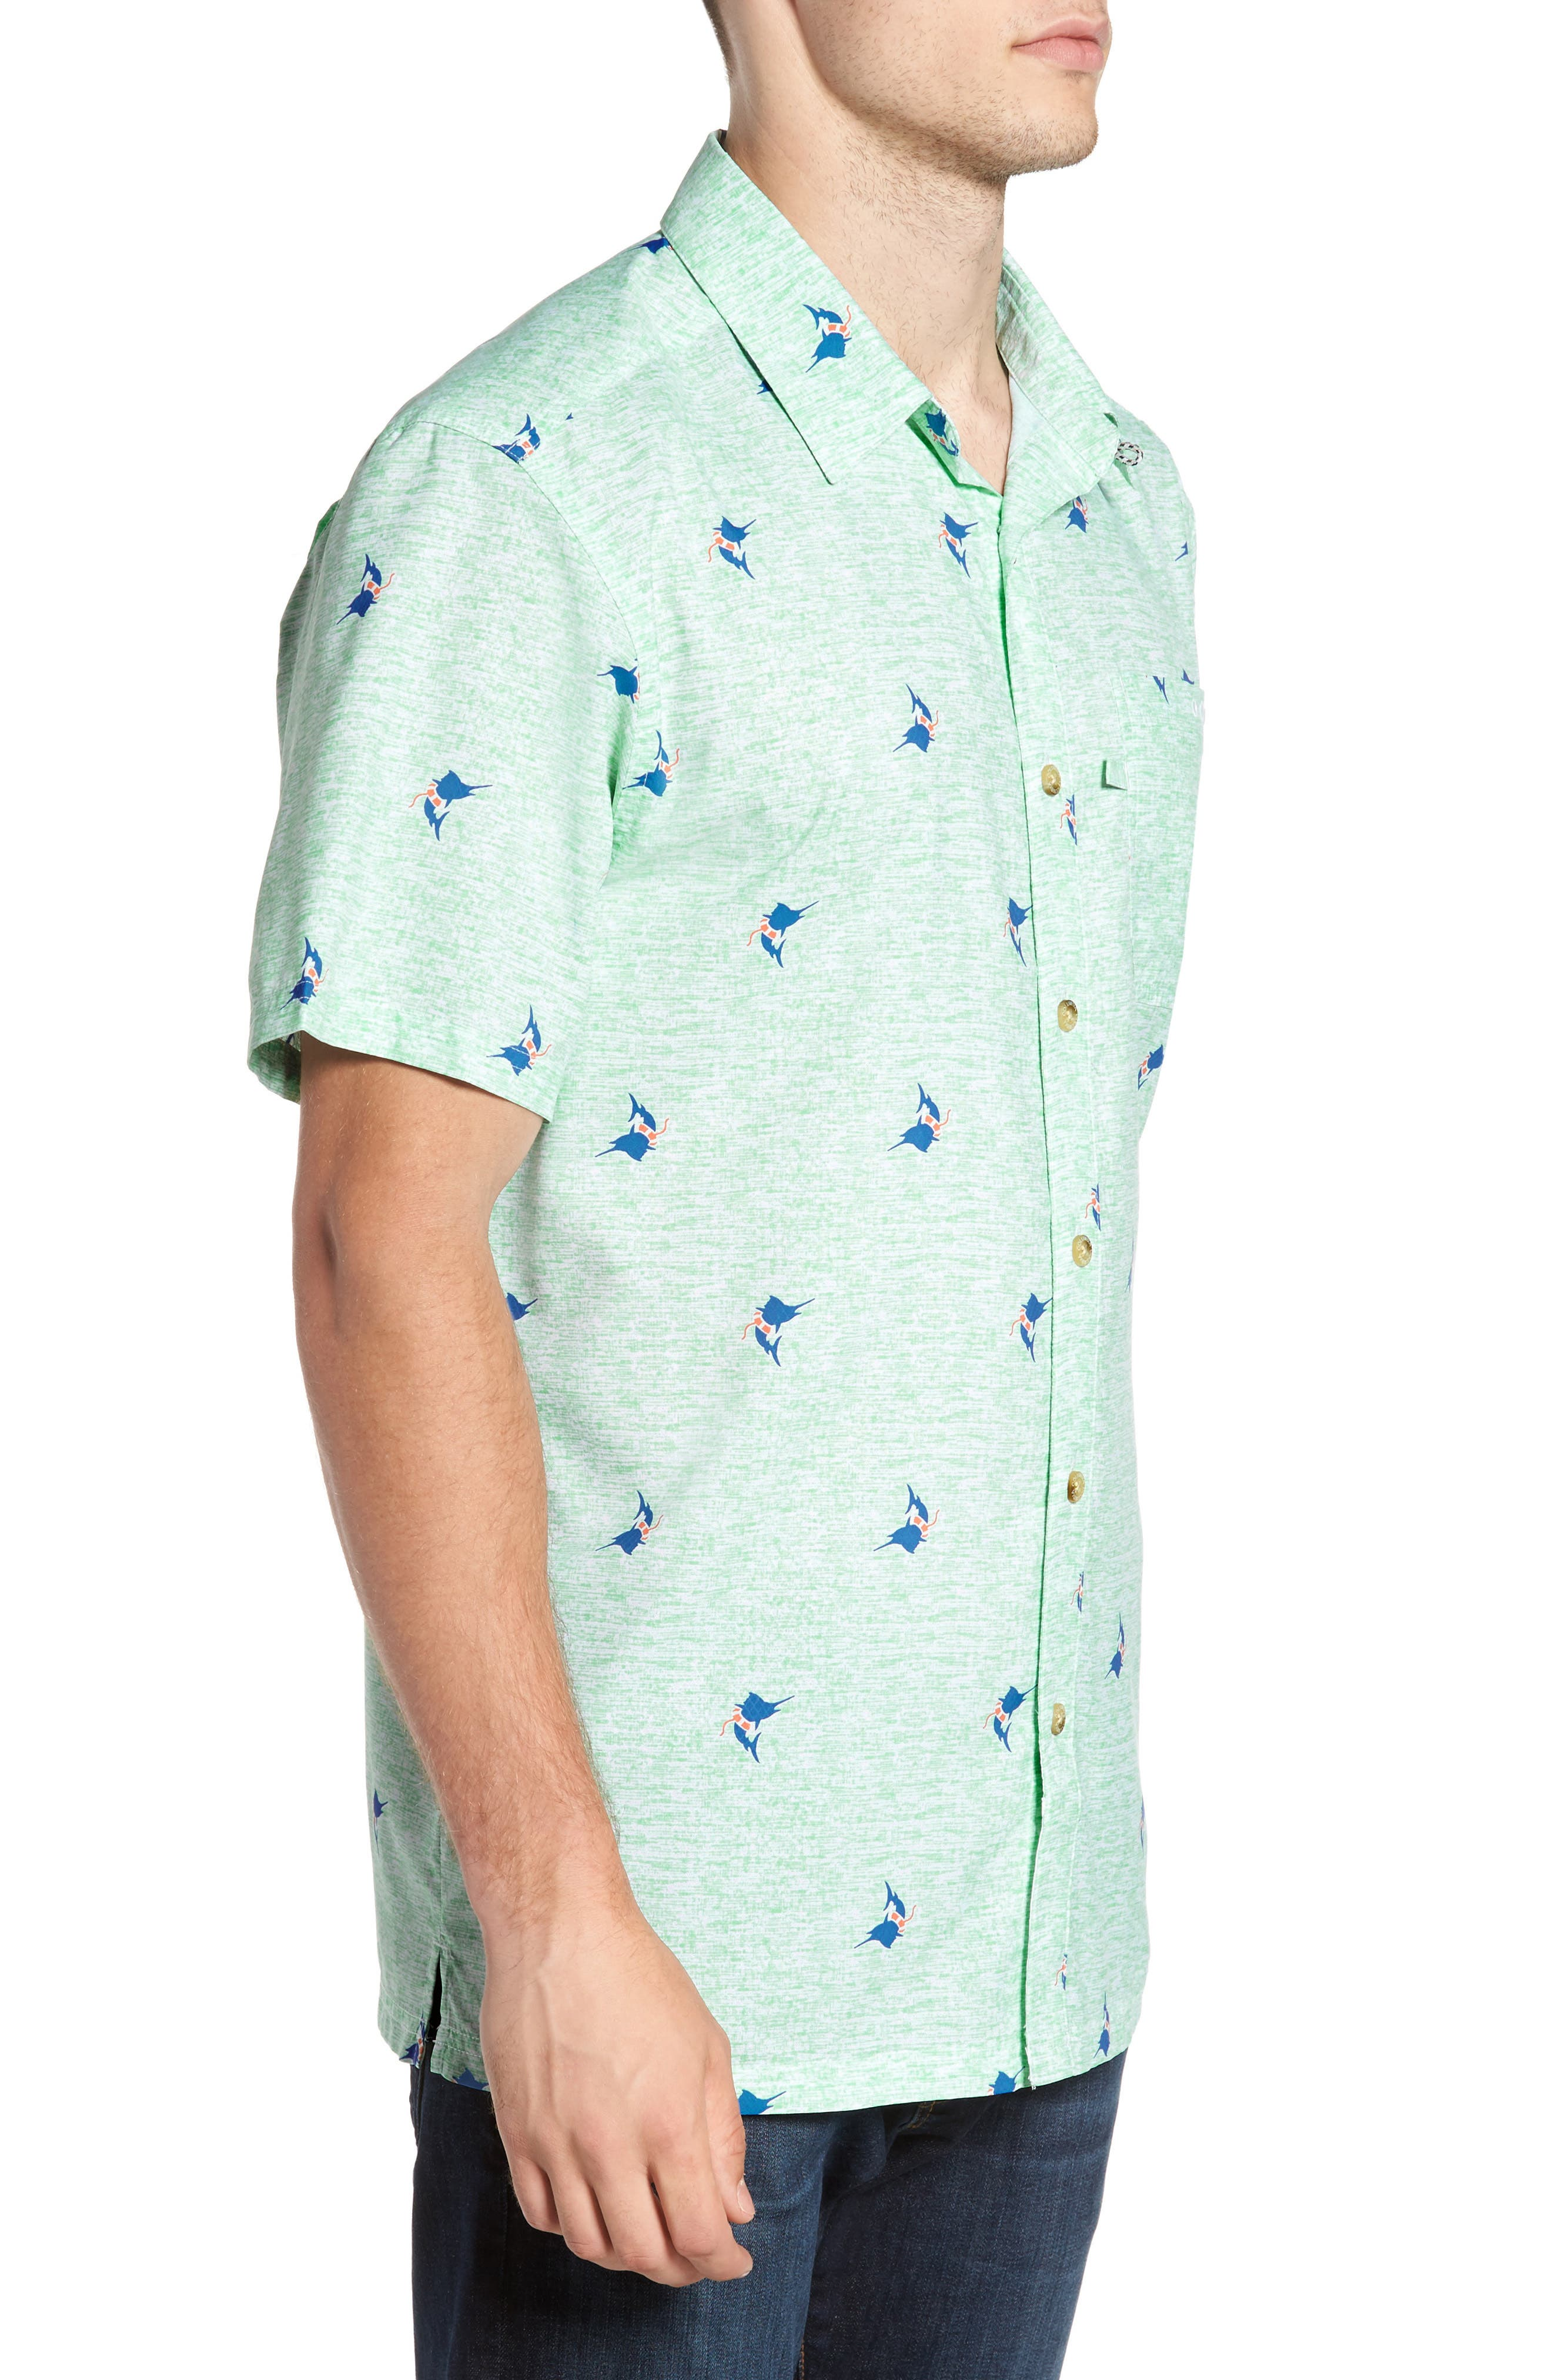 Super Slack Tide Patterned Woven Shirt,                             Alternate thumbnail 3, color,                             Kelp Marlin Print